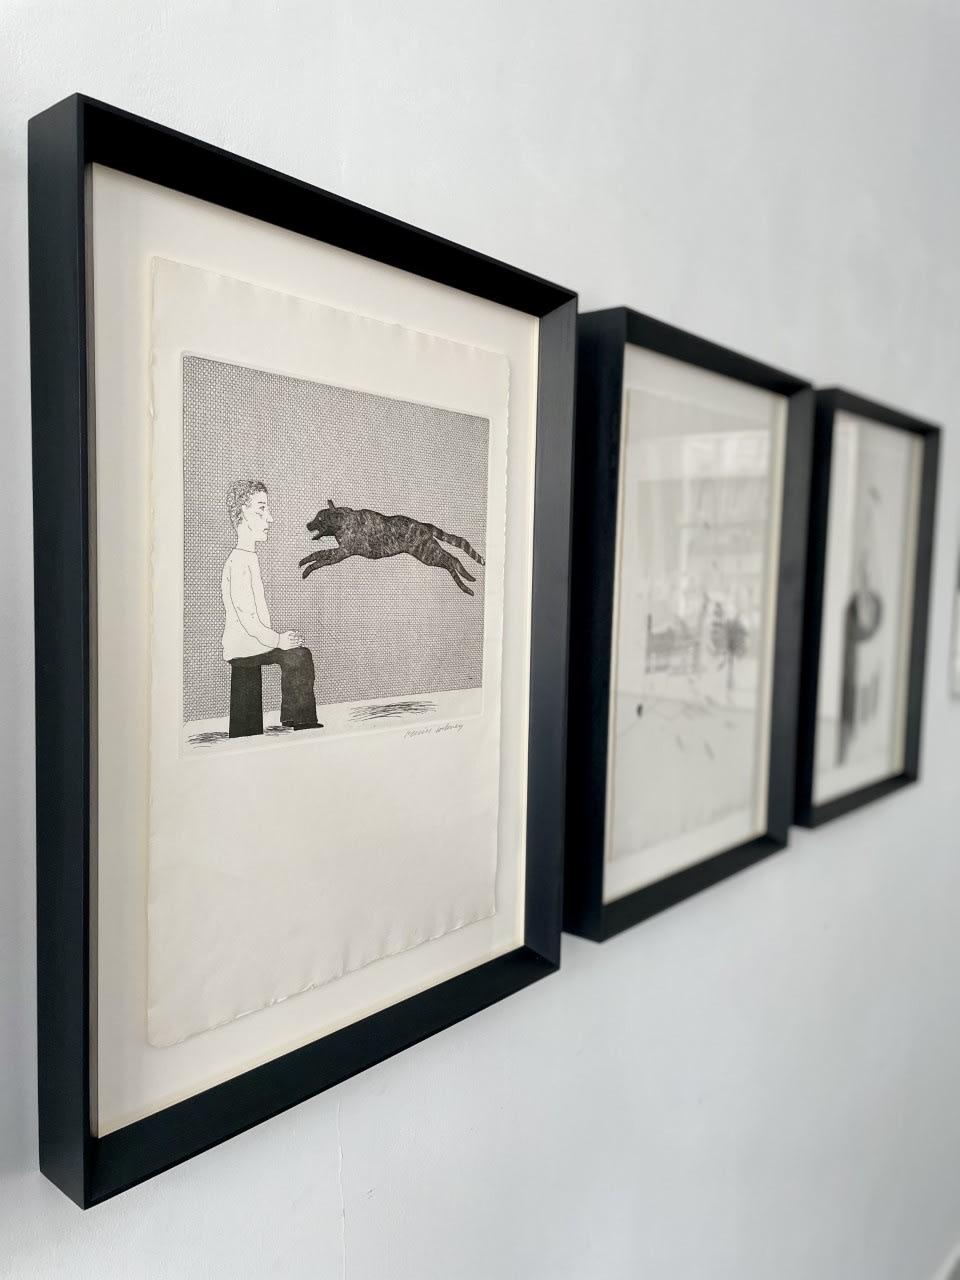 Prints & Fairy Tales: Austin / Desmond Fine Art & Julian Page, May 11-21